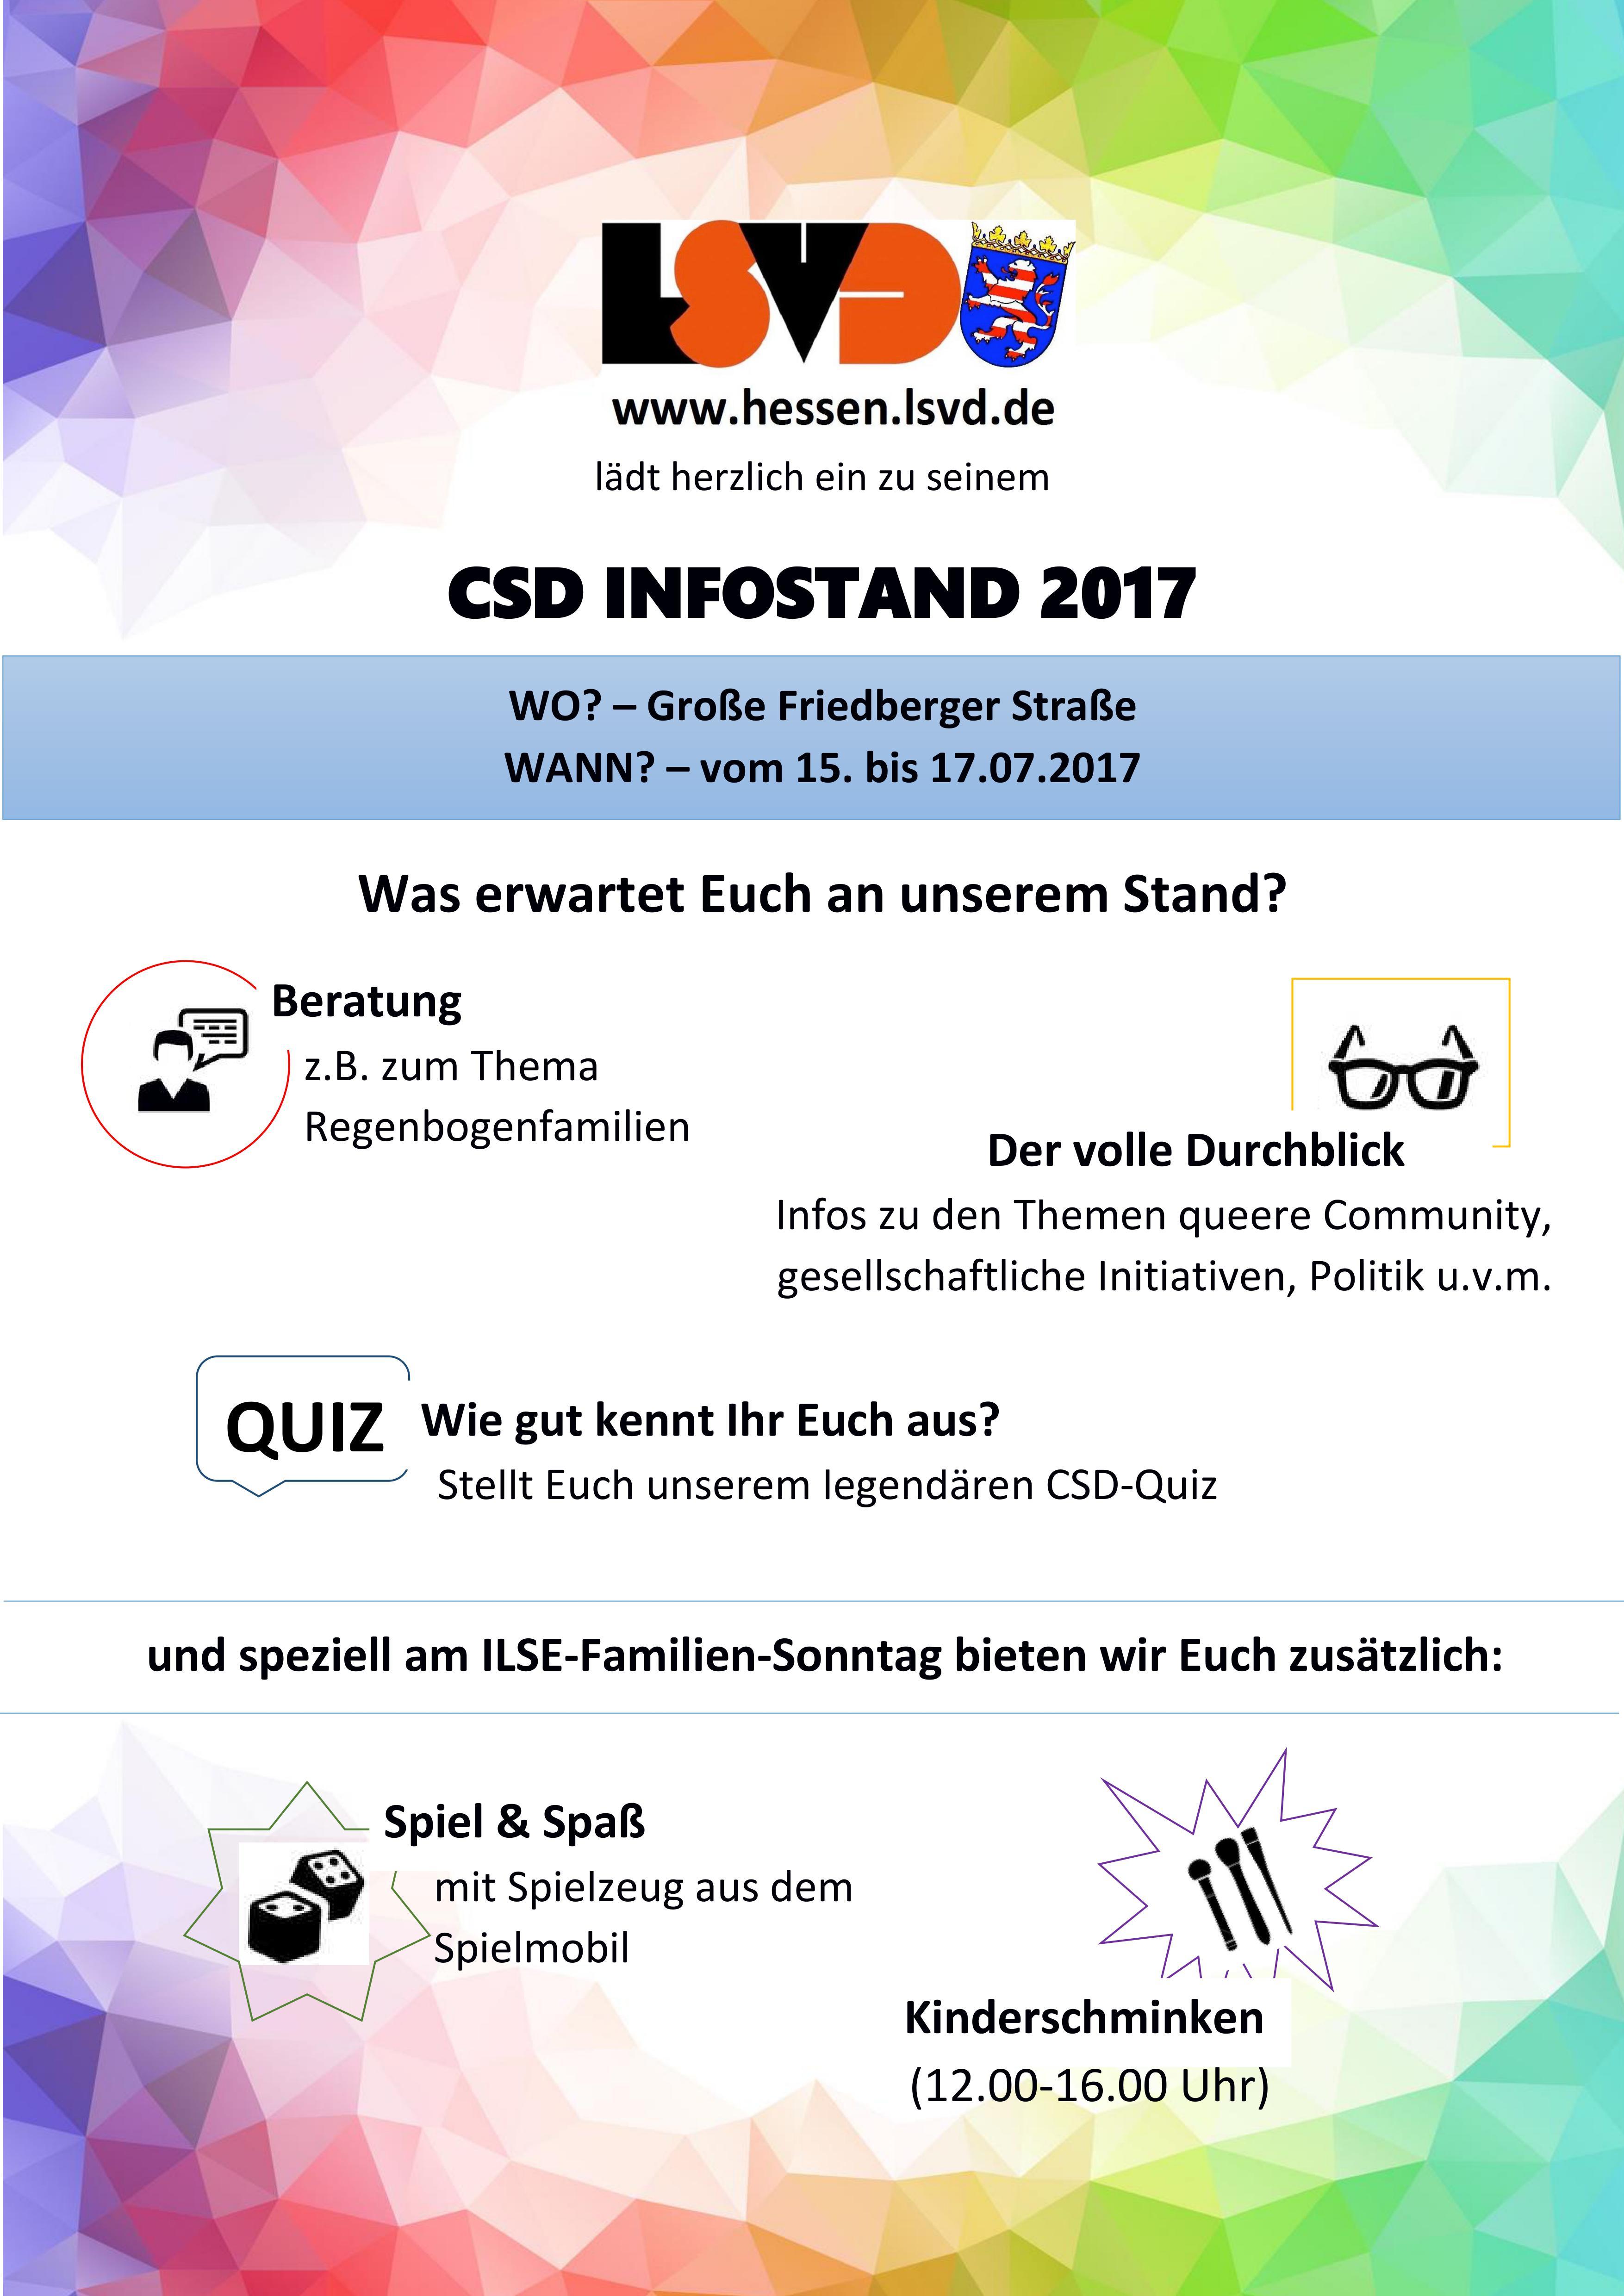 LSVD HEssen CSD Frankfurt 2017 Plakat Infostand